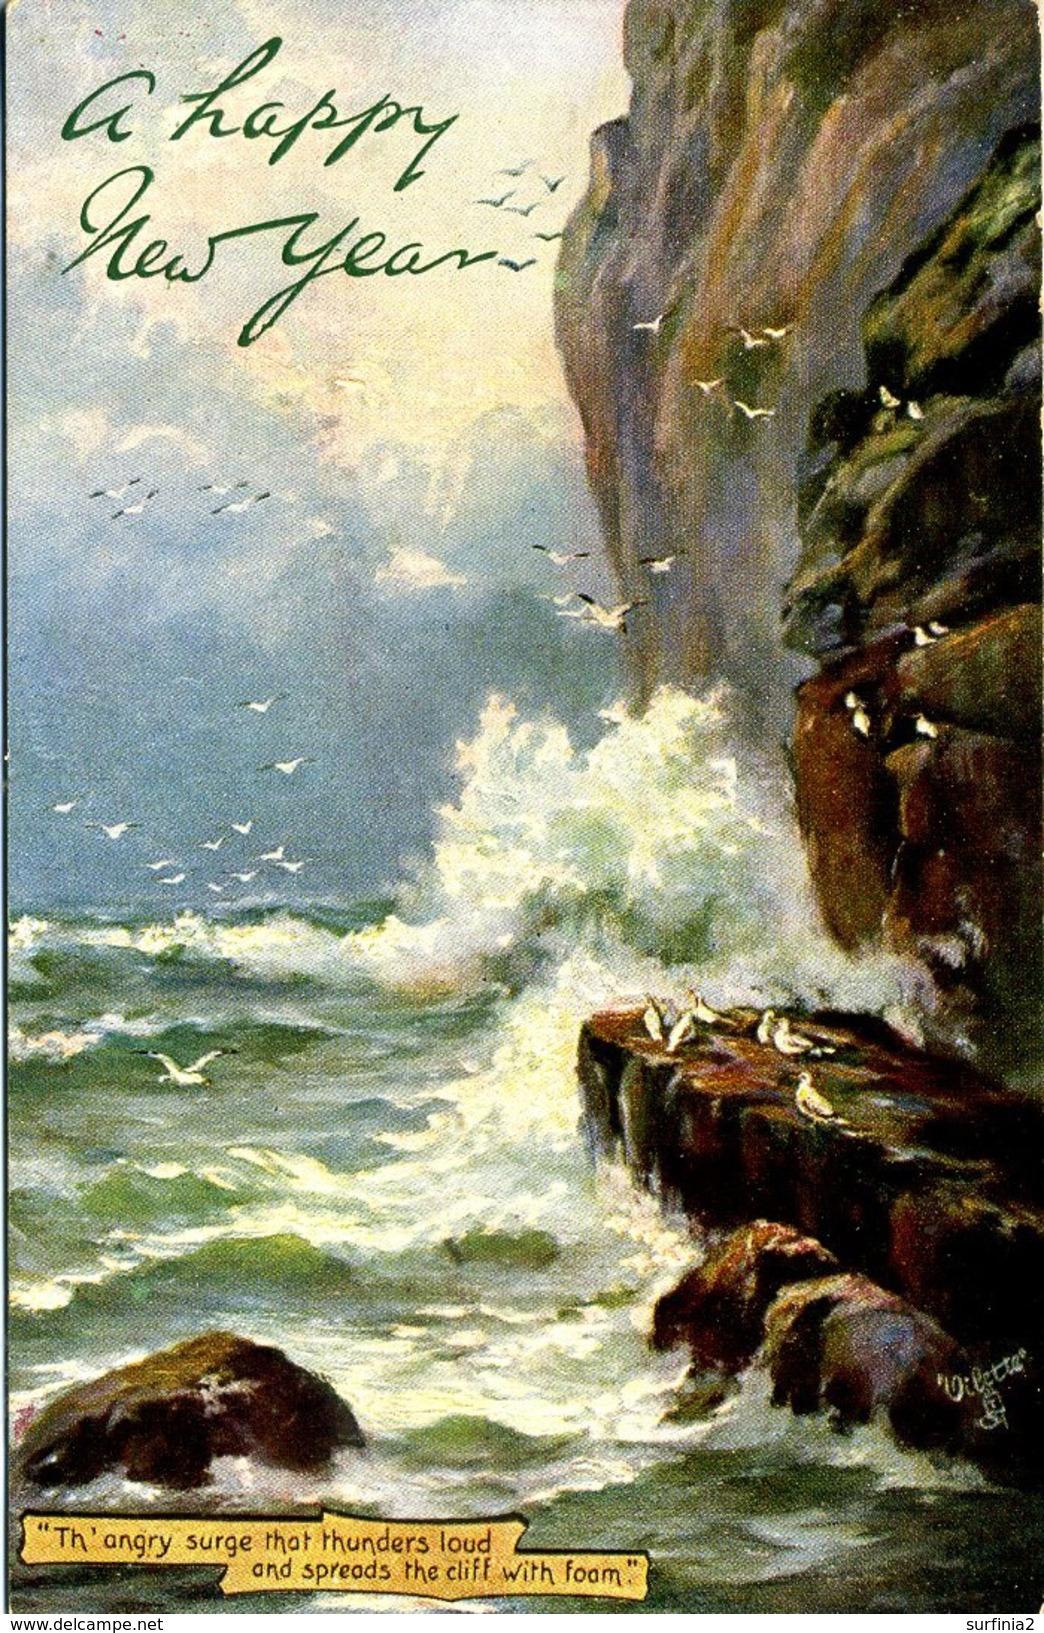 TUCKS OILETTE 9090 - ROUGH SEAS - A HAPPY NEW YEAR - New Year